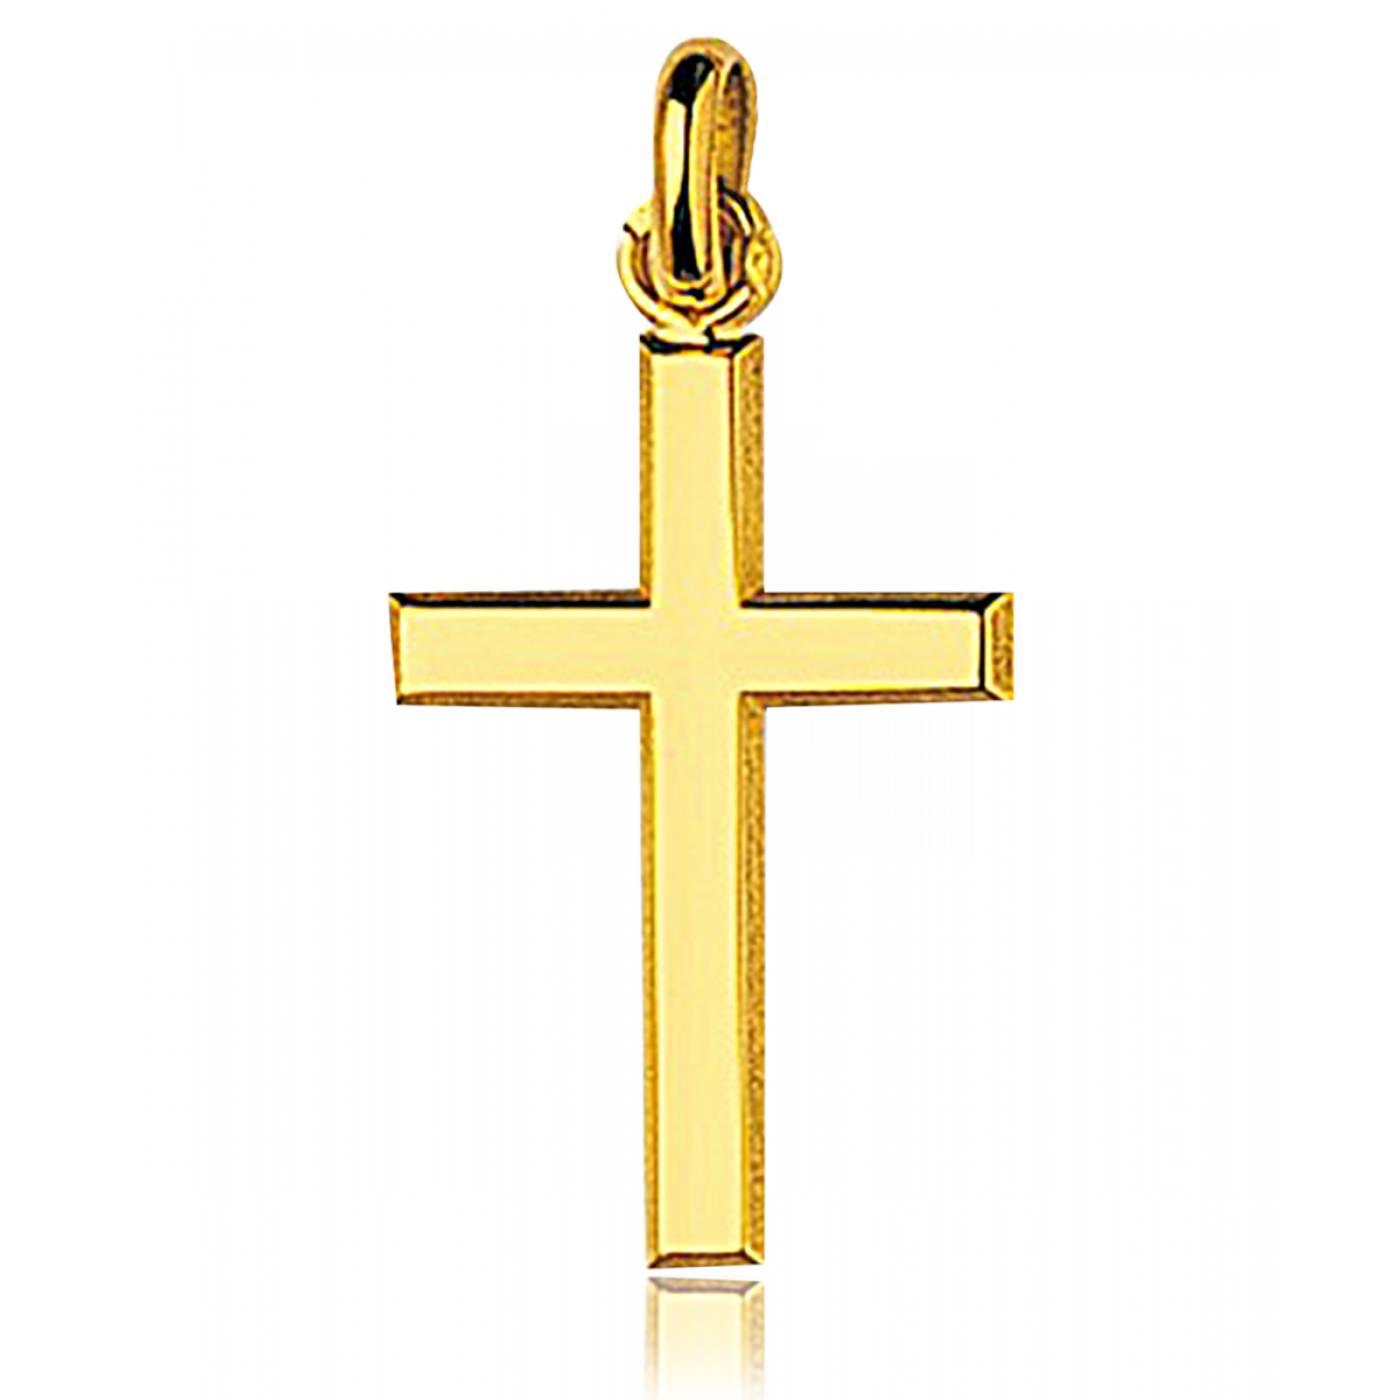 pendentif croix homme femme germogen or jaune 9 carats bijoux paris. Black Bedroom Furniture Sets. Home Design Ideas